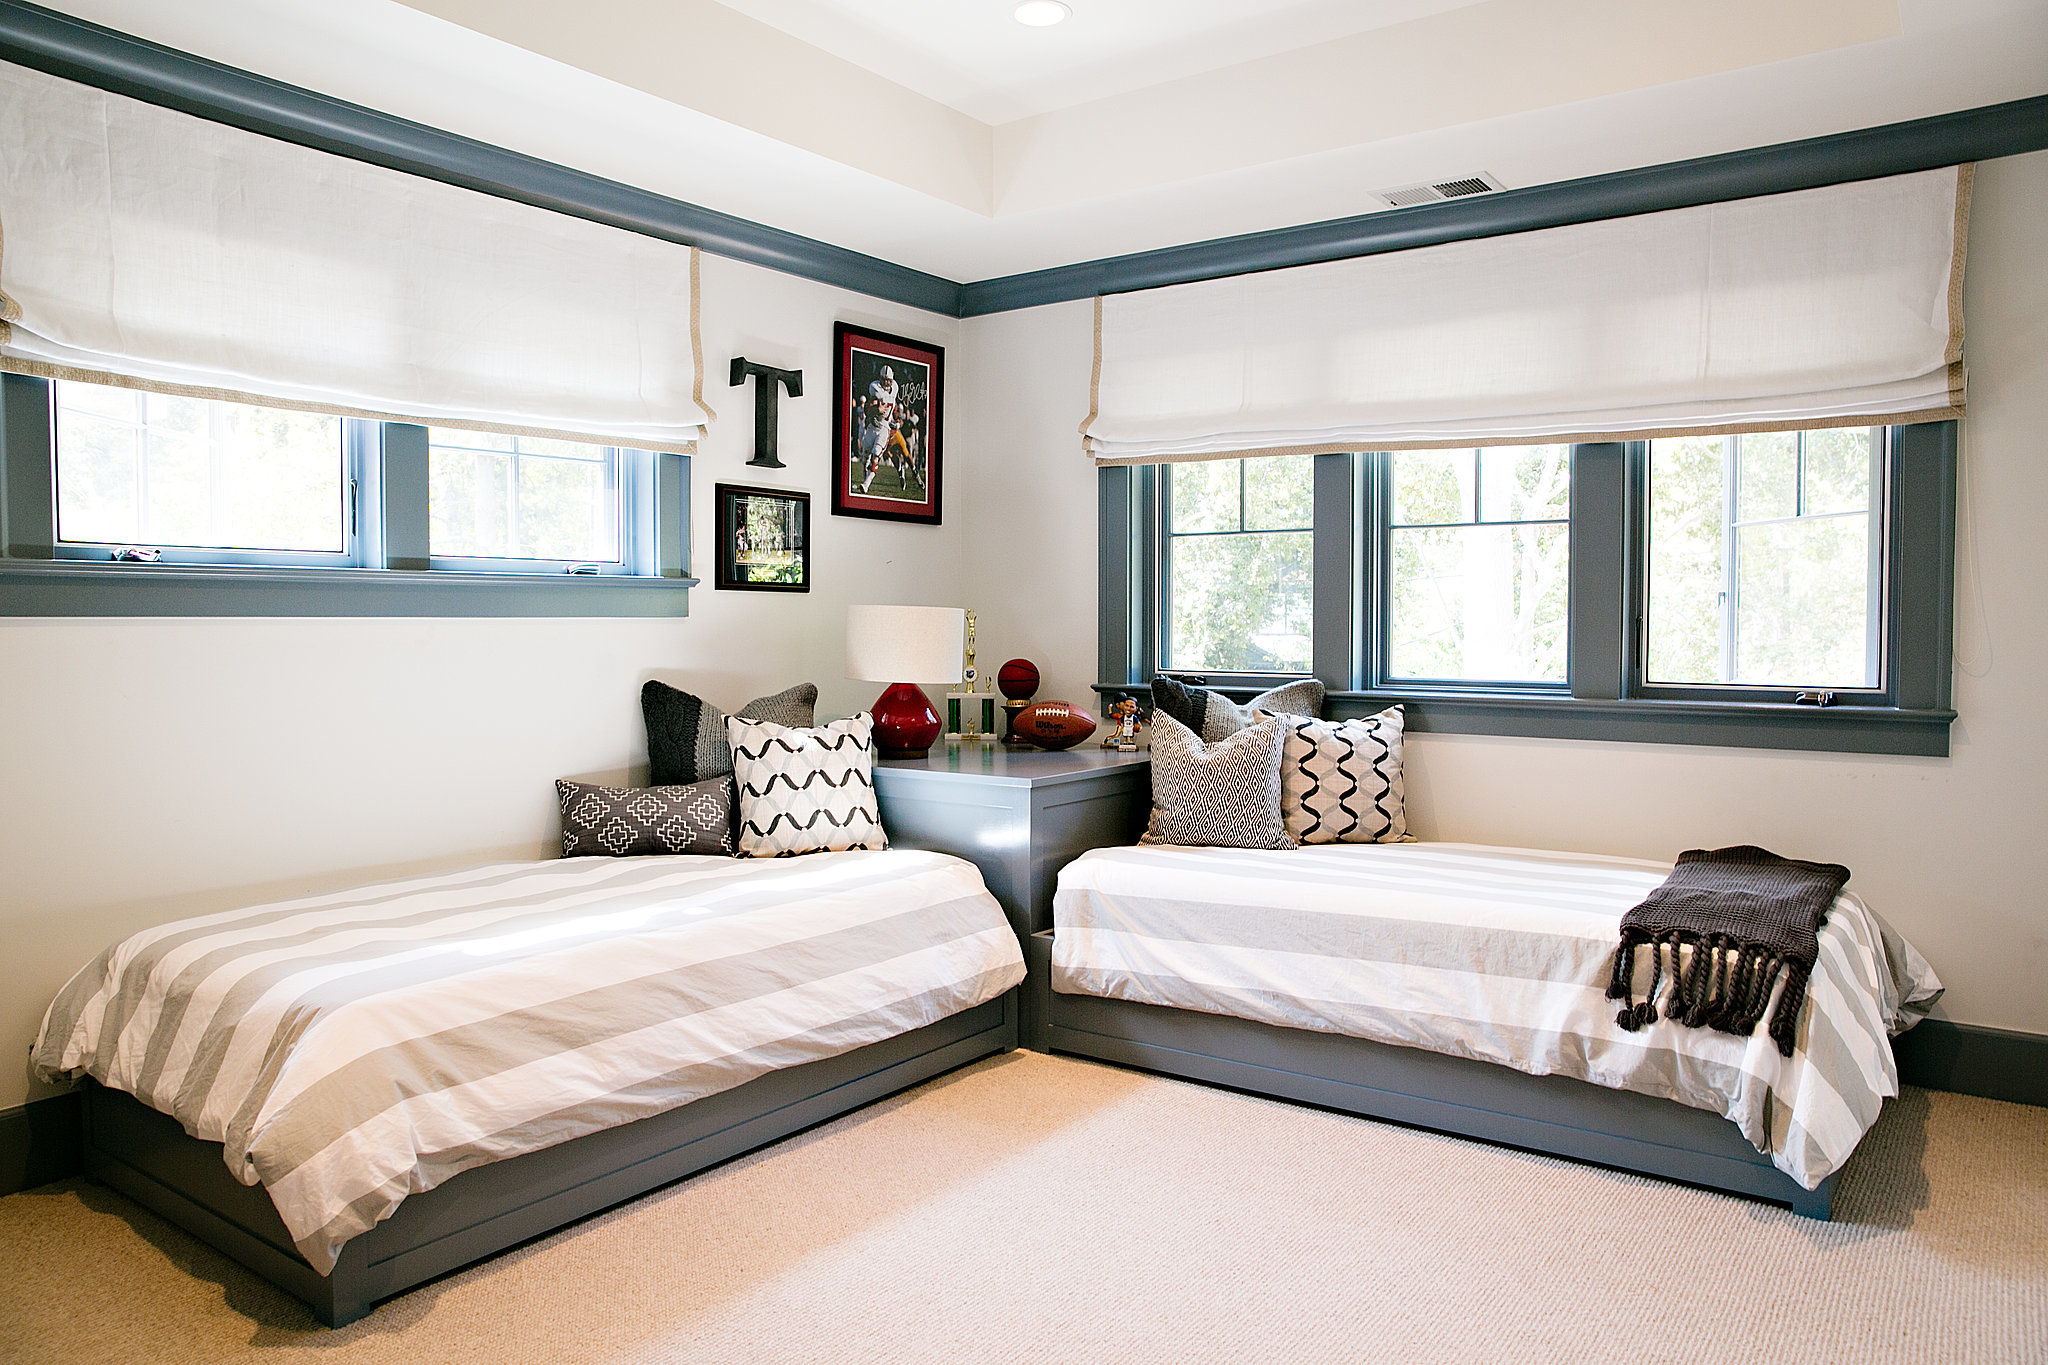 Twin Beds for Boys IKEA - HomesFeed